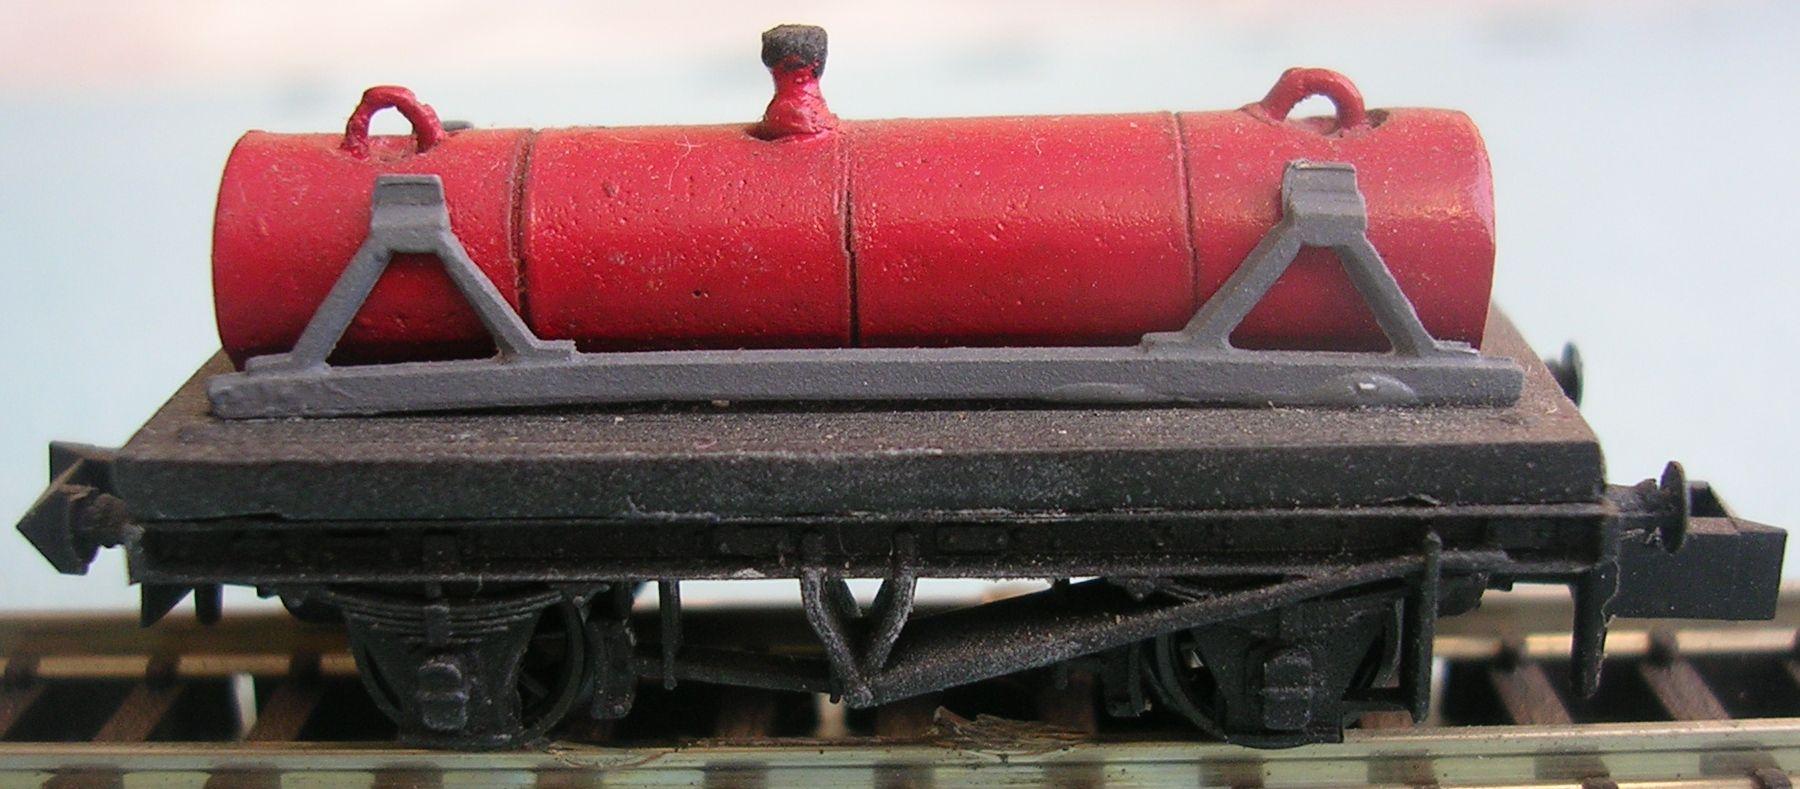 NW40 Vitriol Acid Tank Wagon